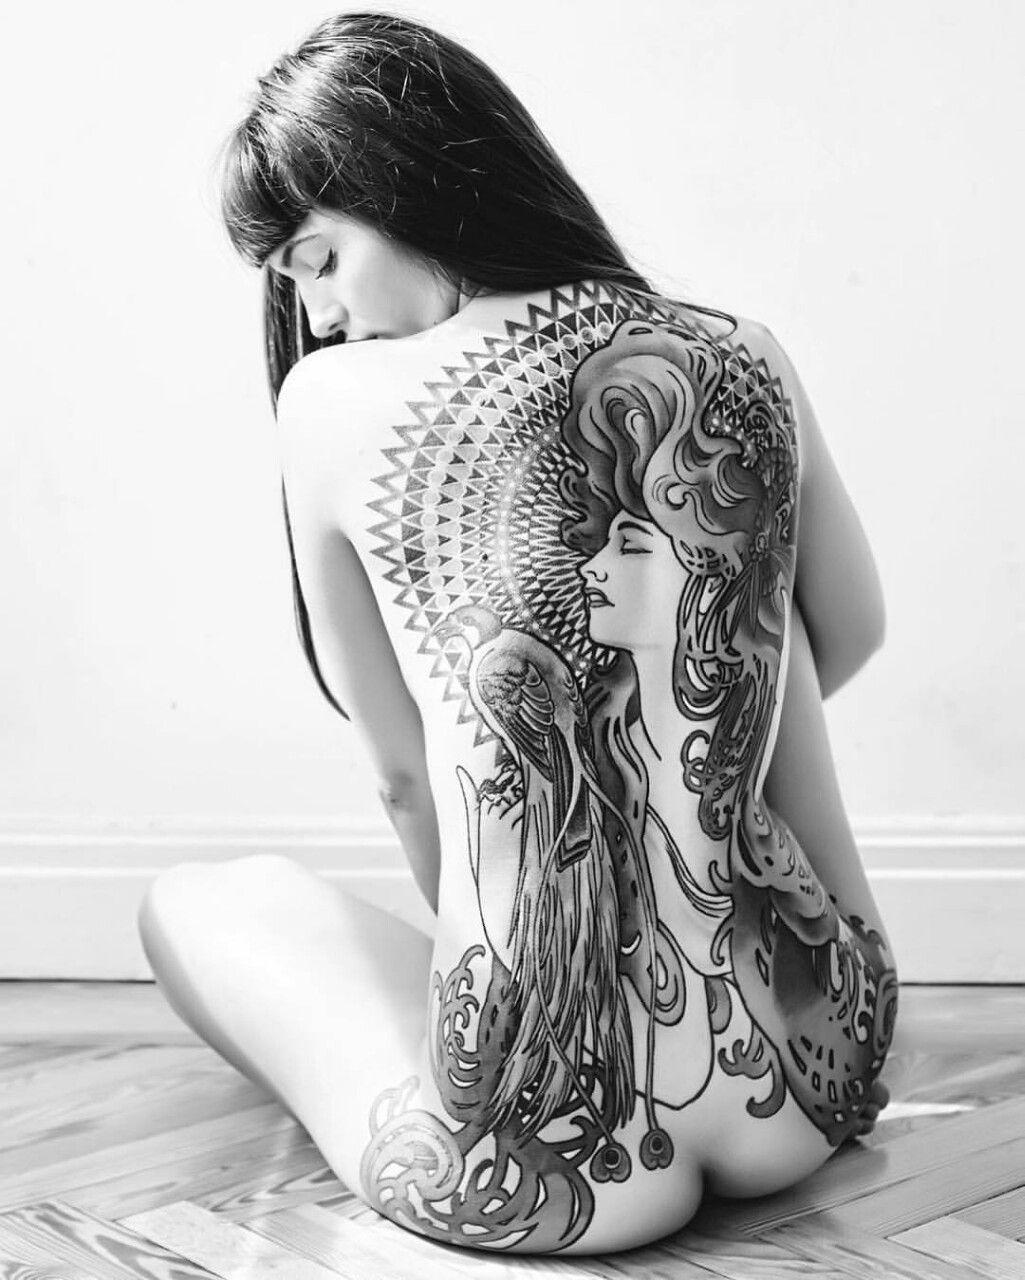 Cool tattoos for a girl ninette suicide  ninette shibara ninetteshibara  tattoo babe